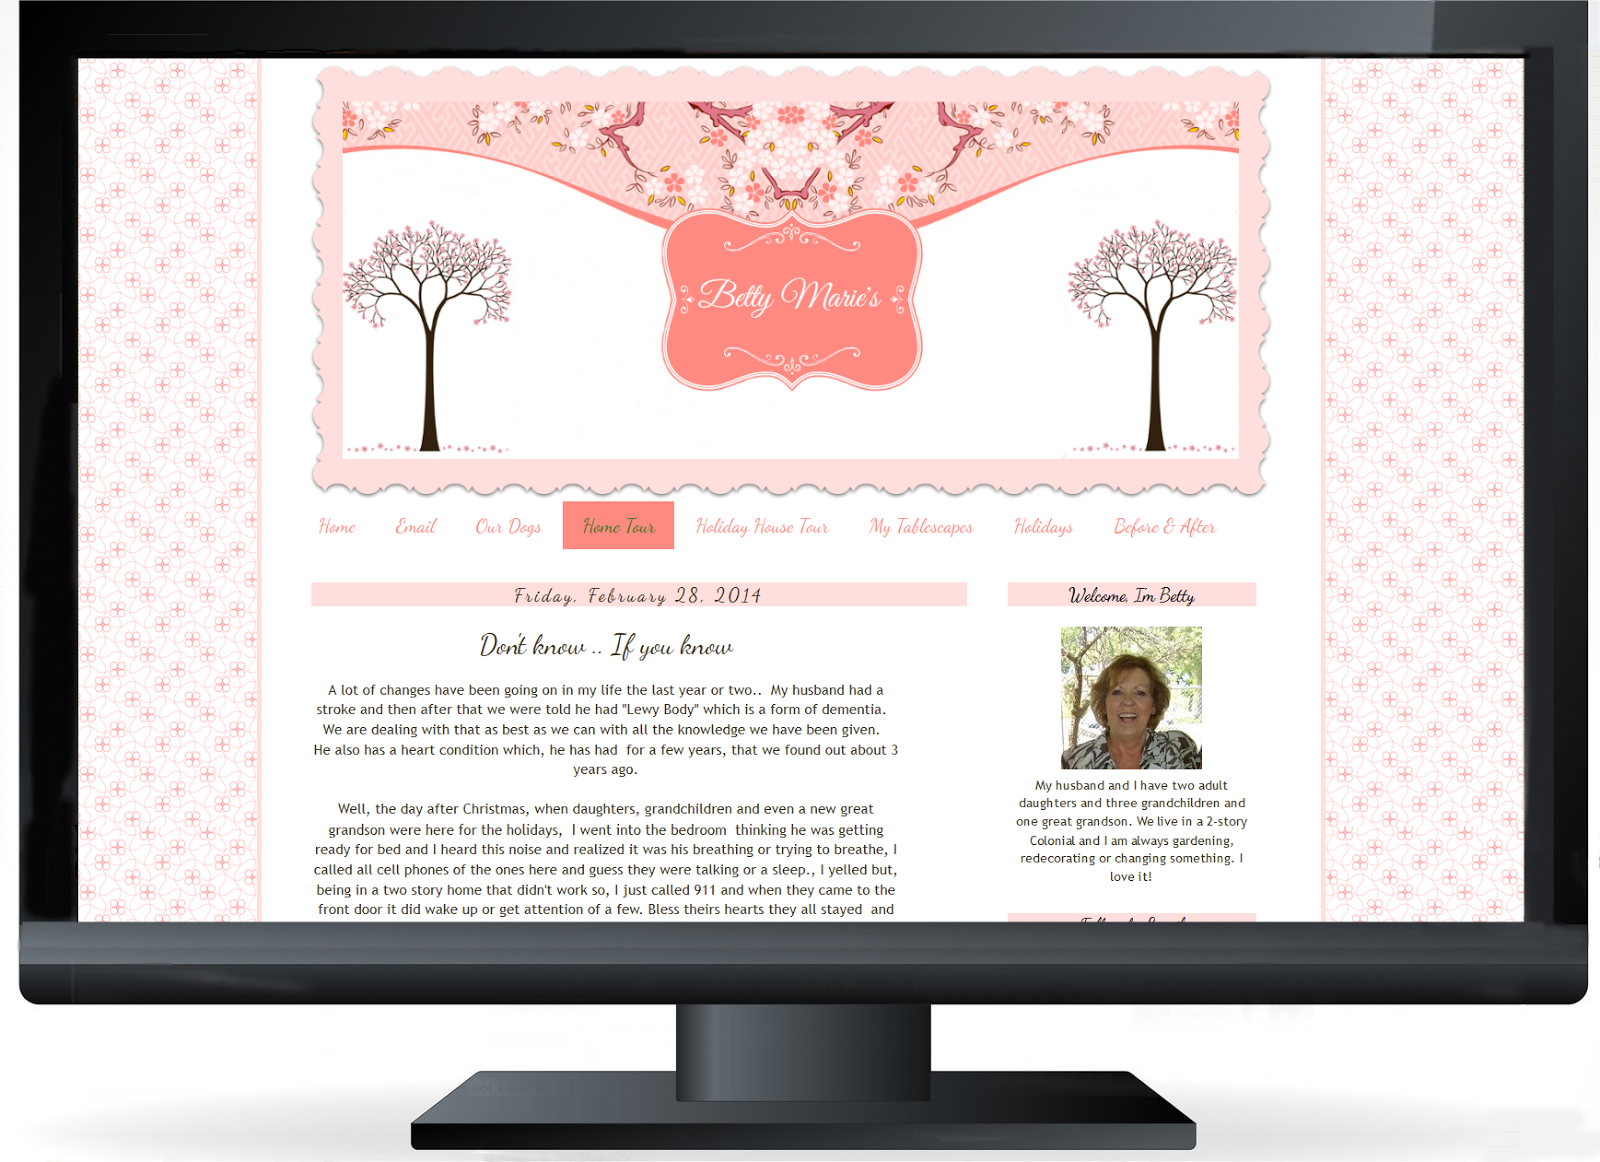 www.bettymaries.blogspot.com